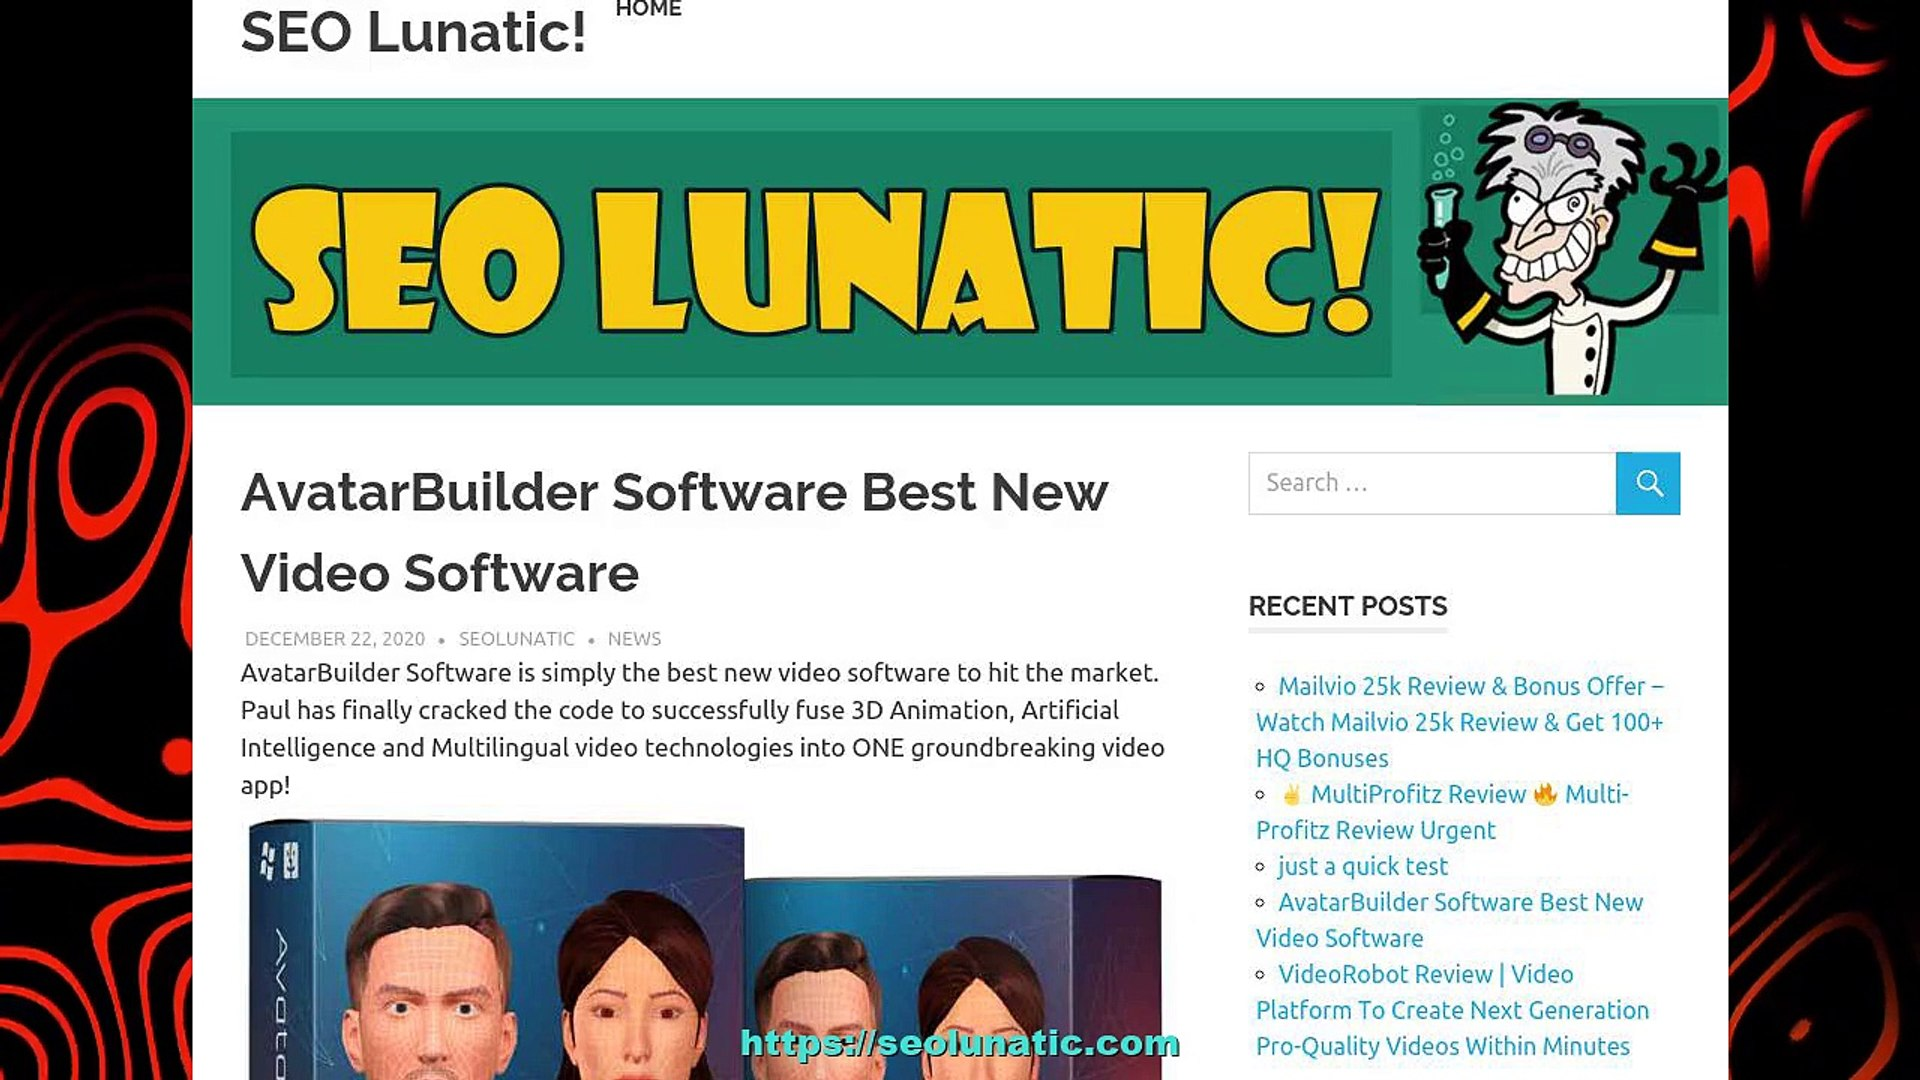 AvatarBuilder Software Best New Video Software